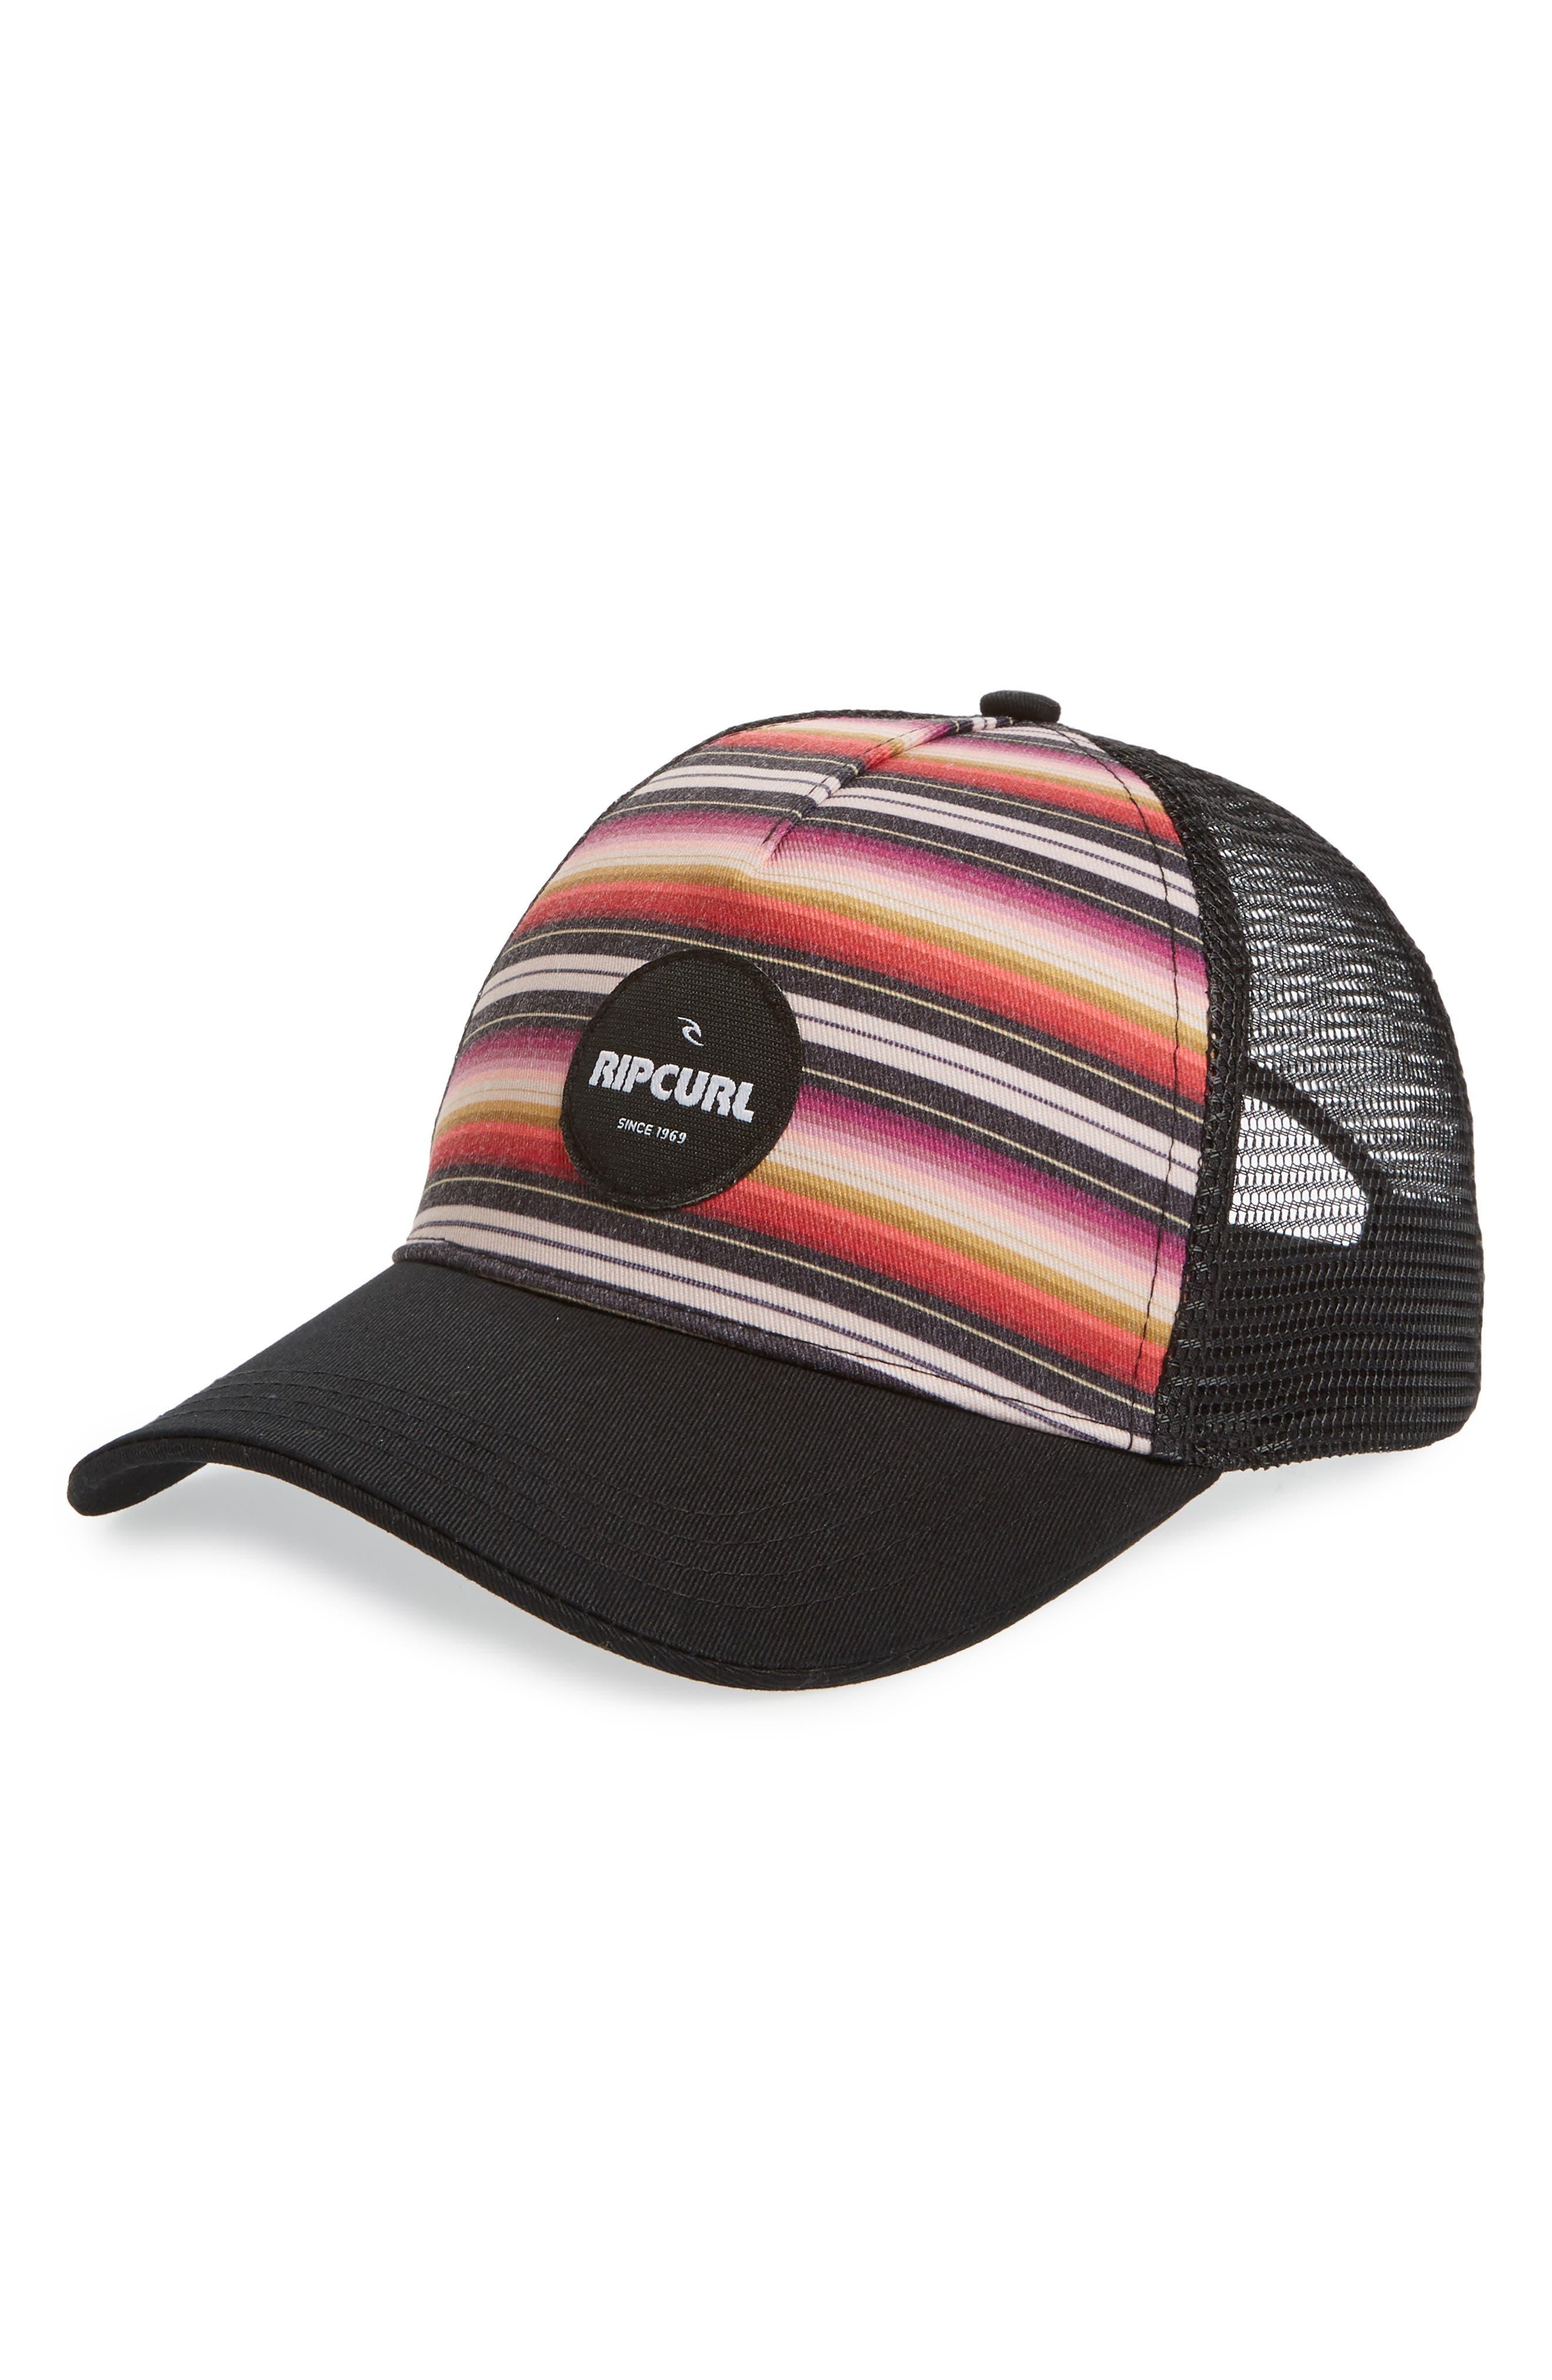 Sayulita Trucker Hat,                             Main thumbnail 1, color,                             Black